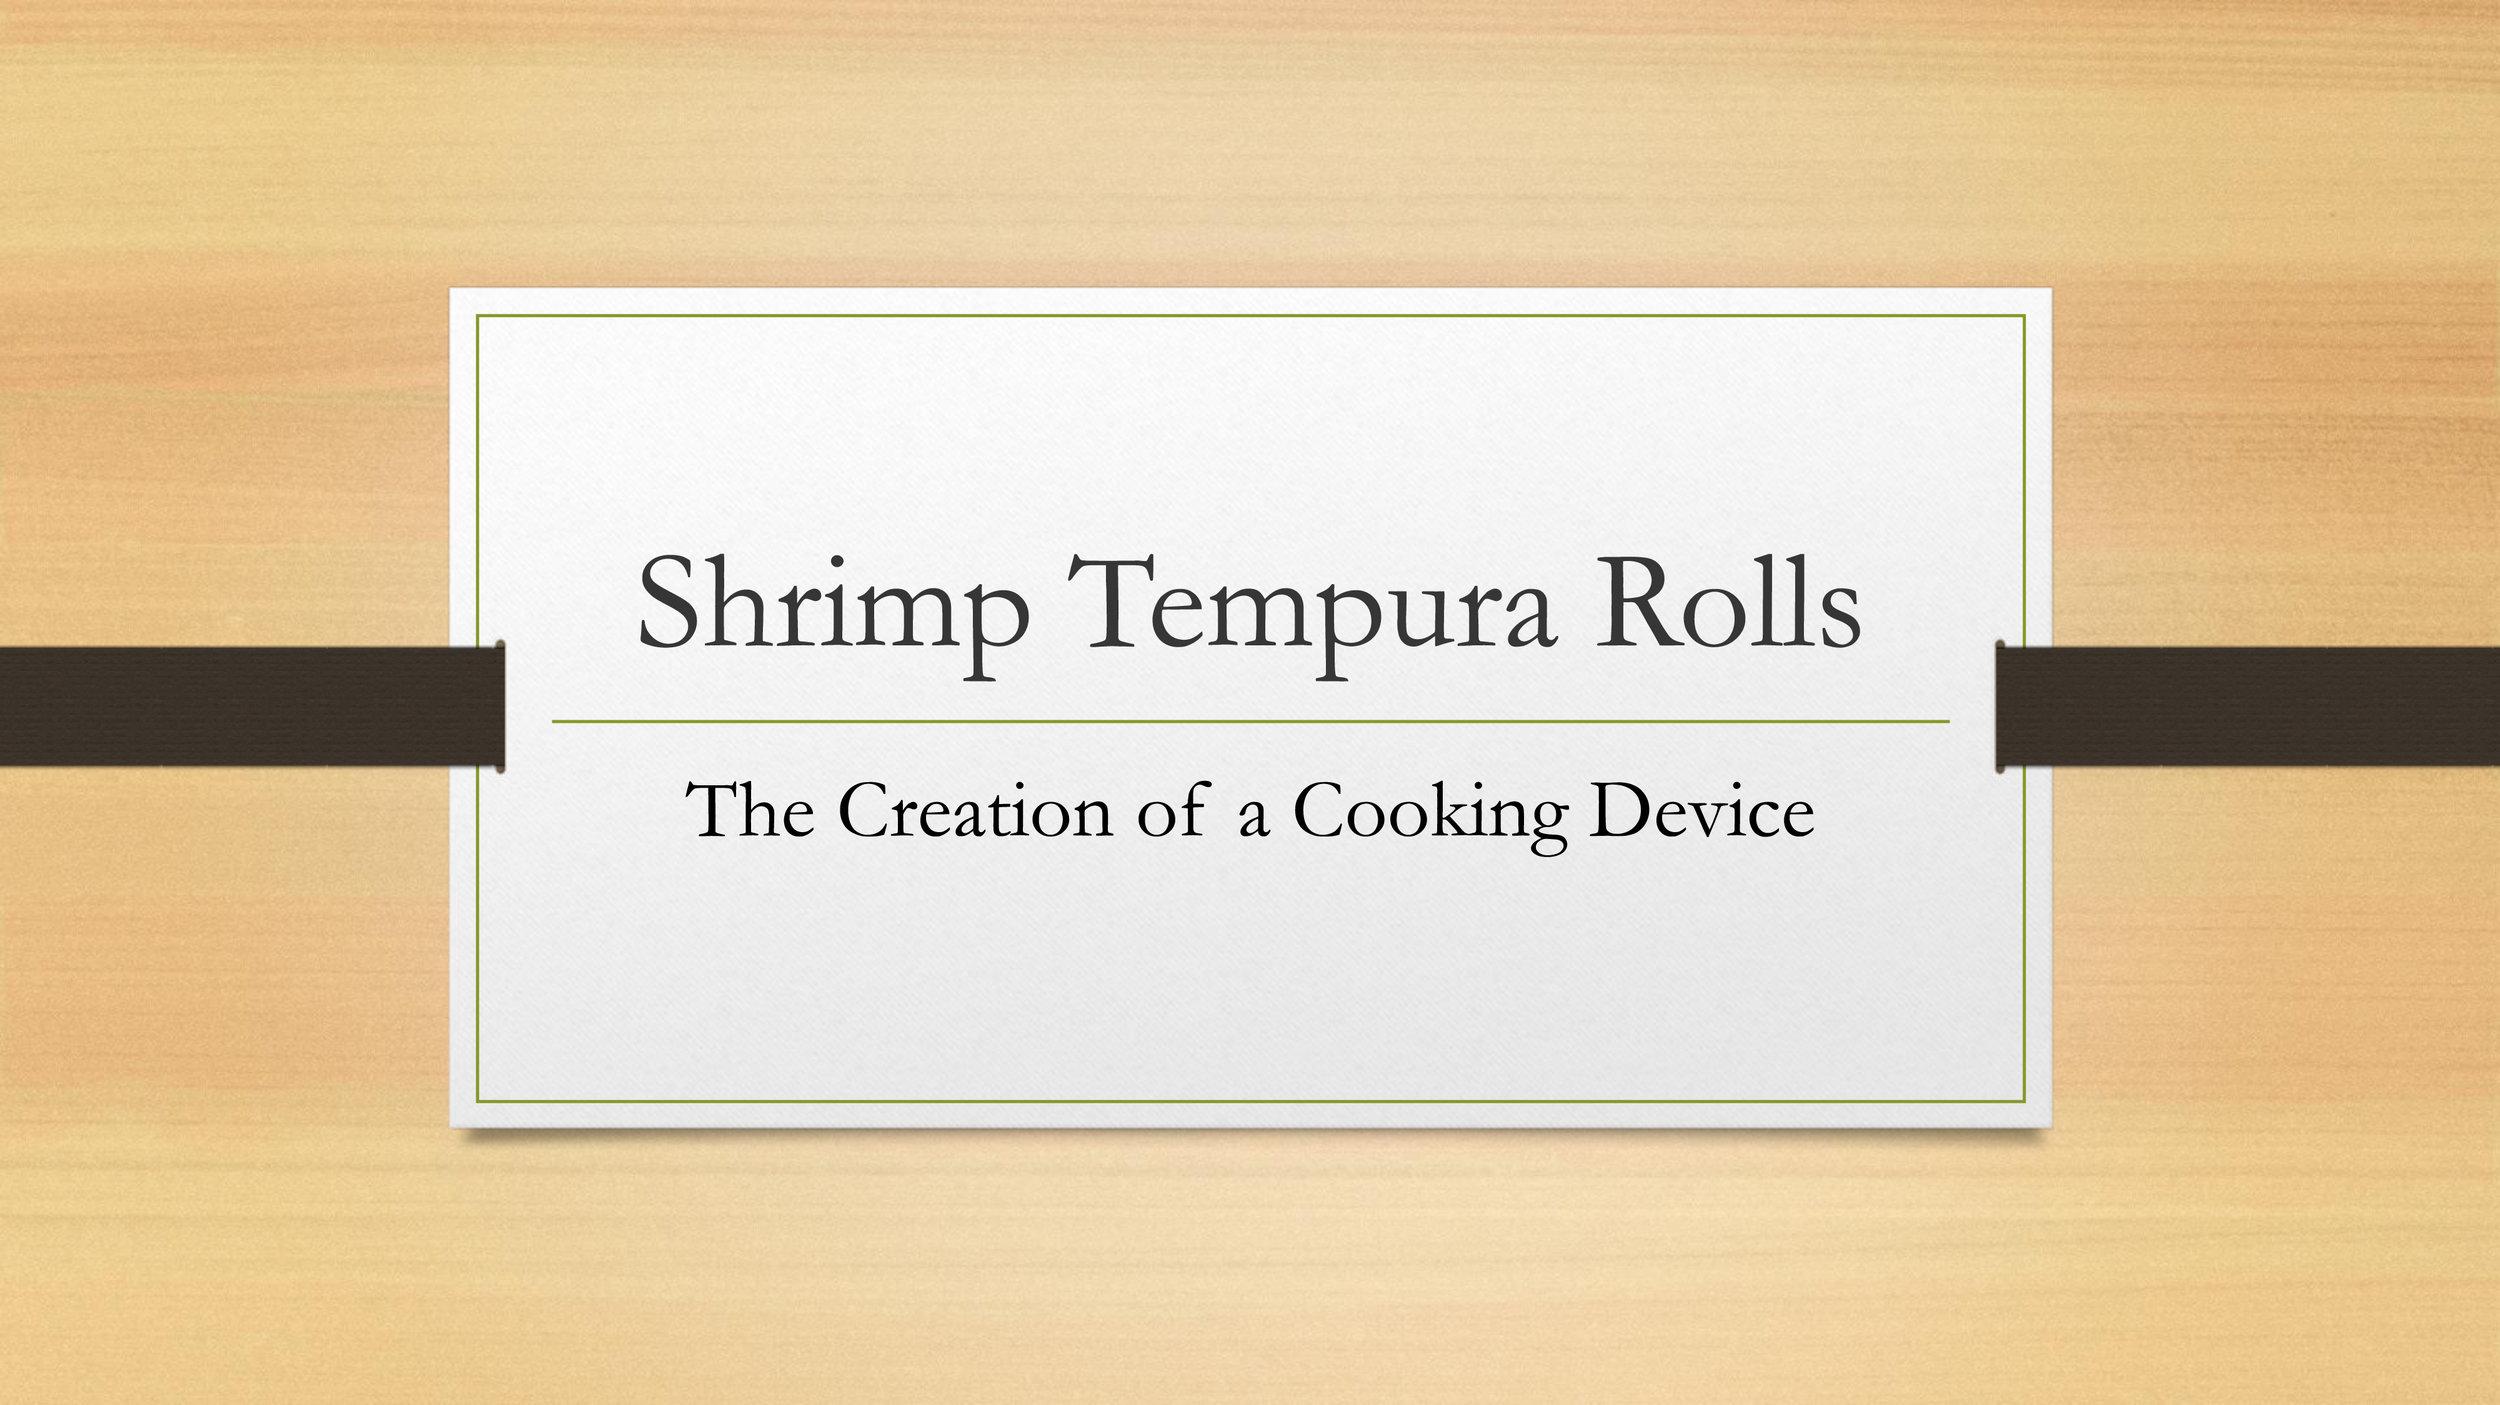 Shrimp Tempura Roll Cooking Device